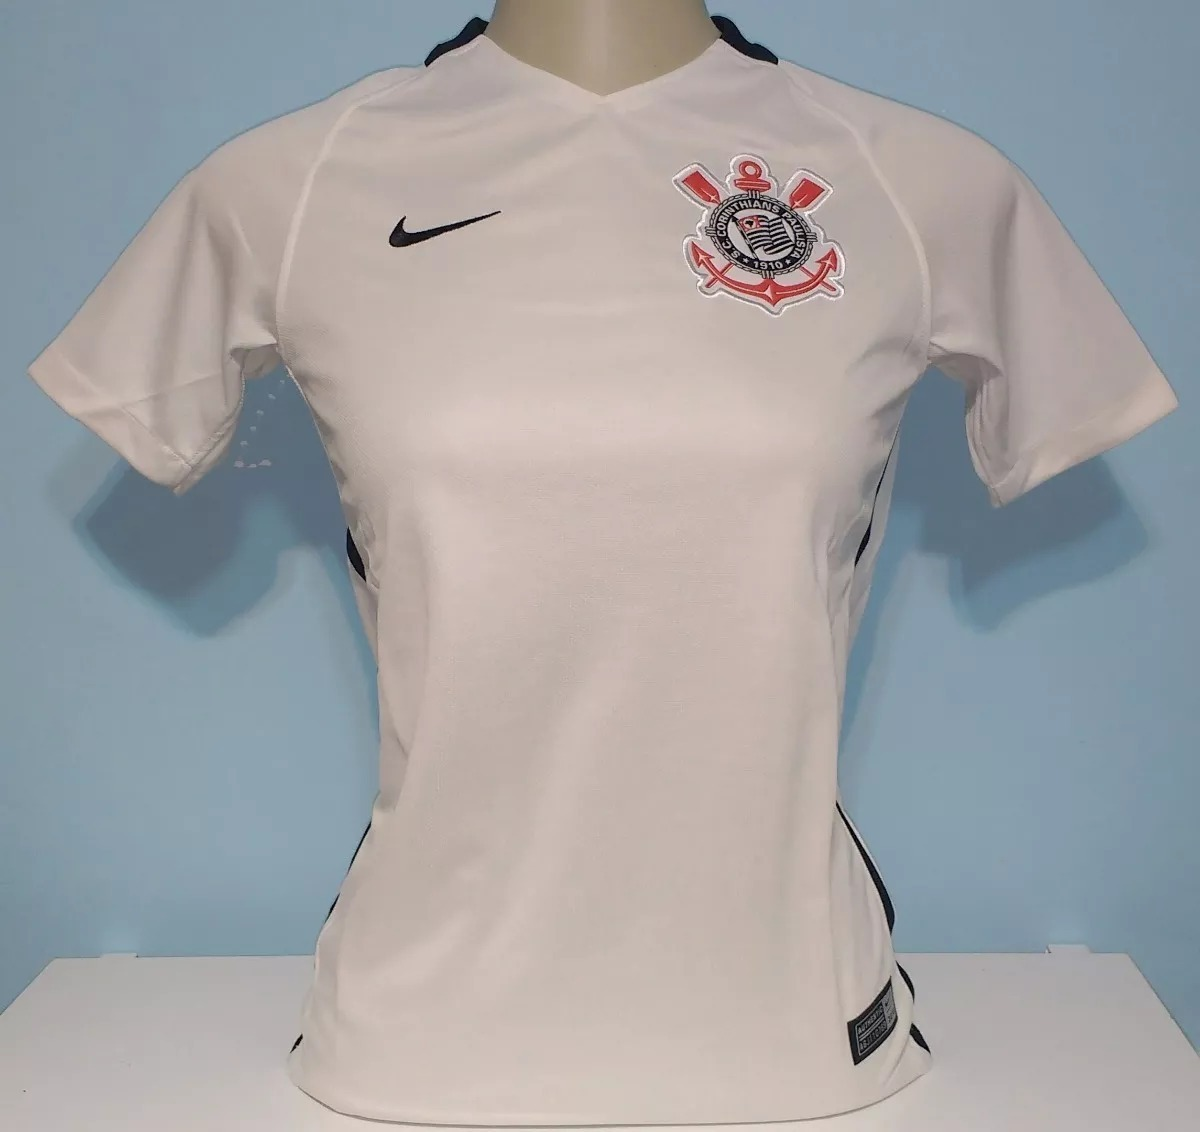 Camisa Corinthians Original 100% Nike Feminina - 78 - R  138 50a9f6bb148a8